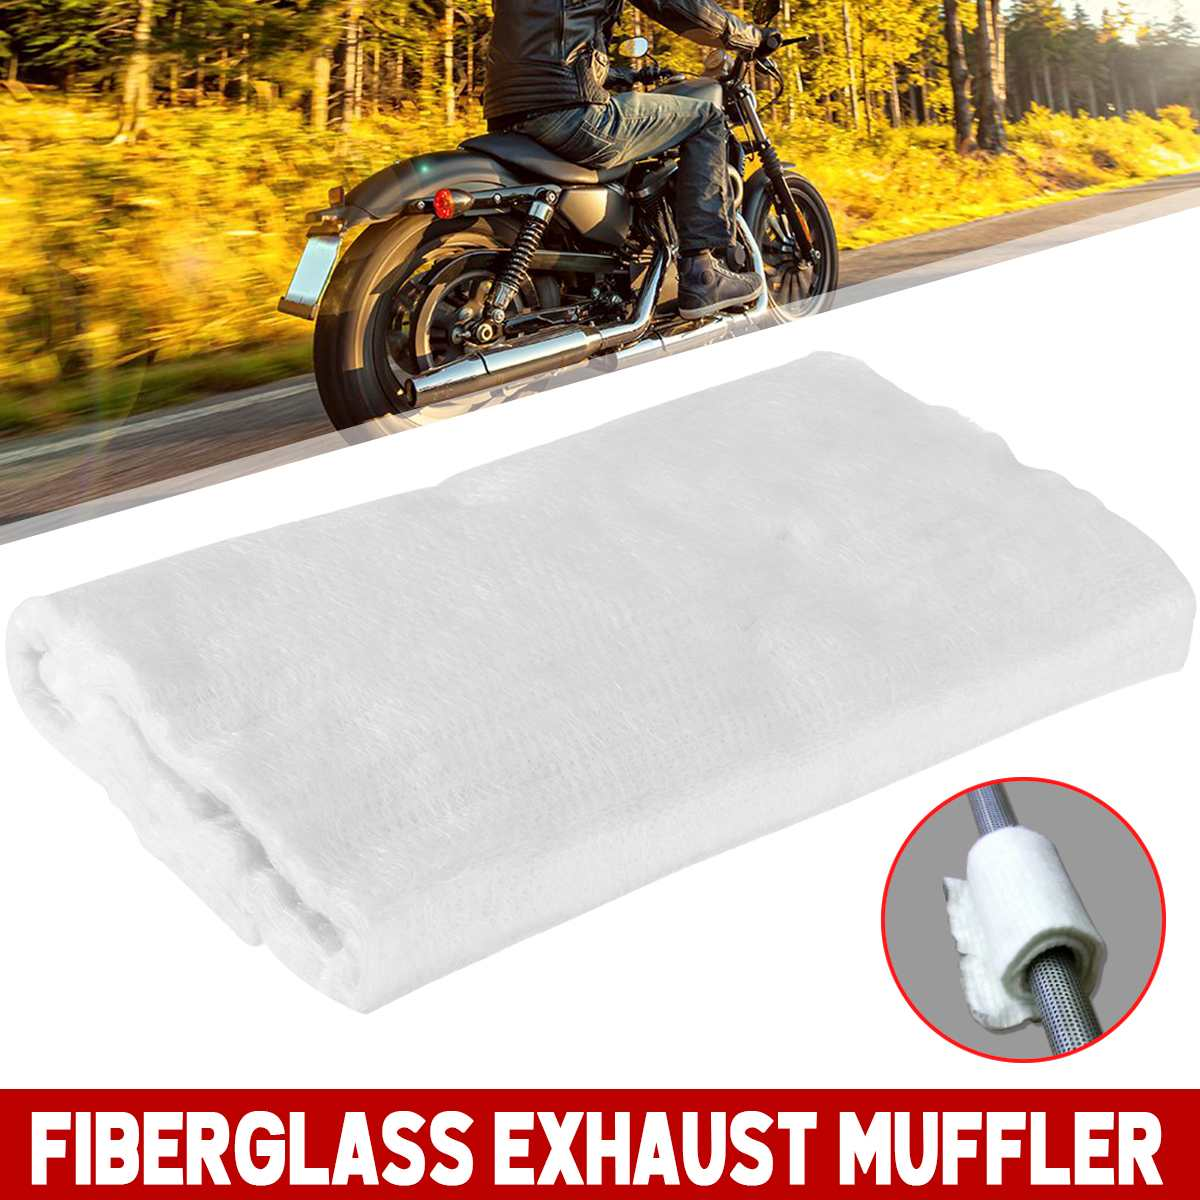 Tubo de Escape de Escape Moto Escape de fibra de vidrio E-Glass Silenciador Silenciador de fibra de embalaje de tela for la motocicleta universal